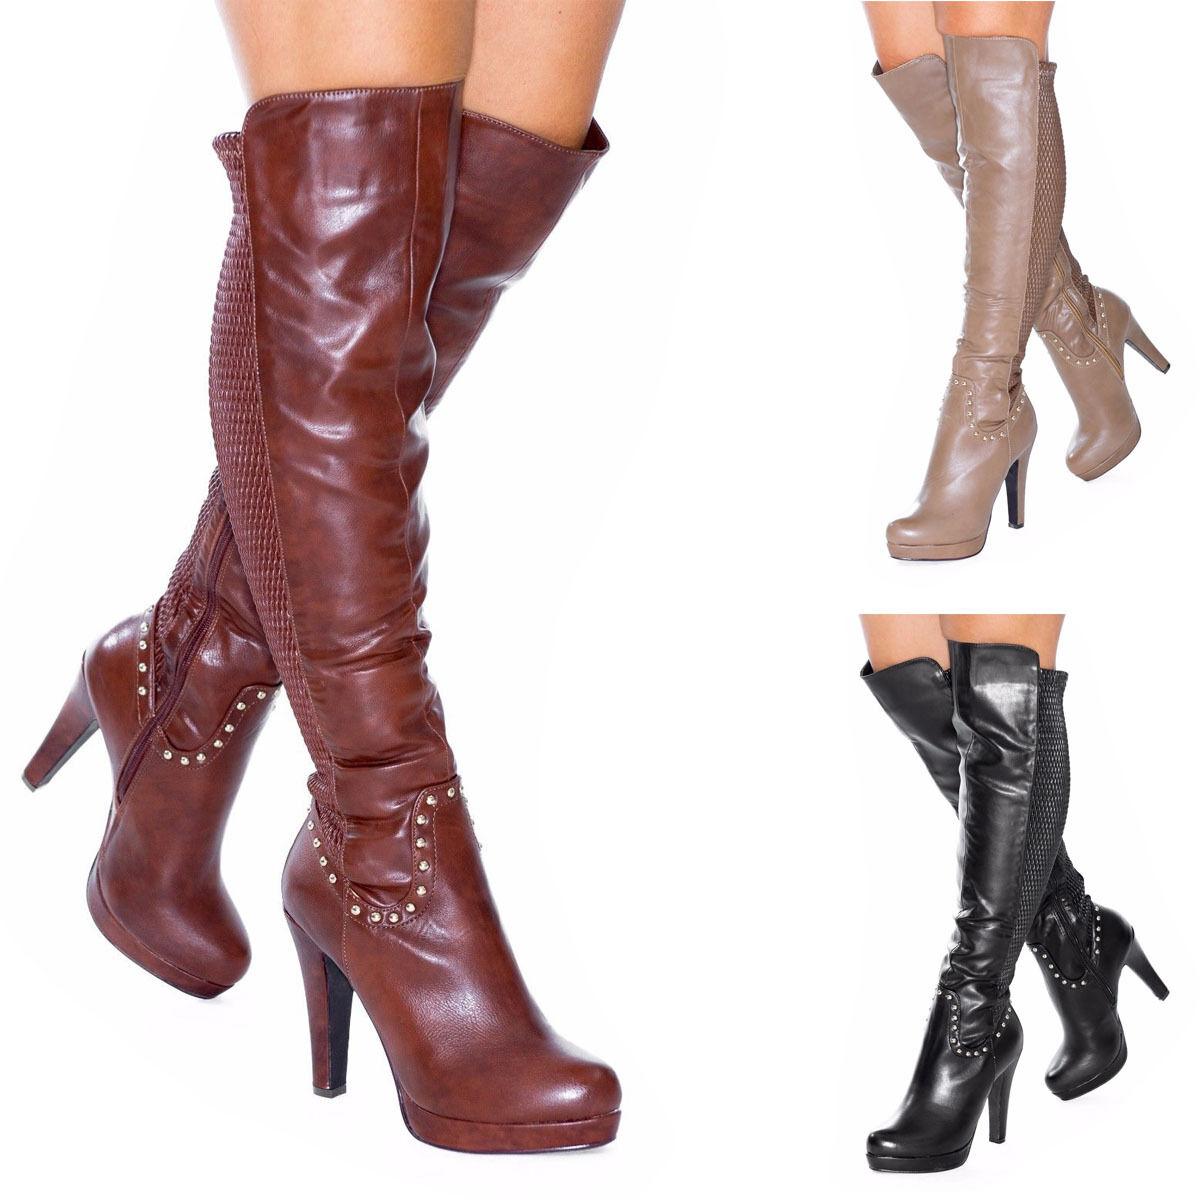 Women's Ladies Over The Knee High Studs Western Cowboy Stiletto Heel Boots Size